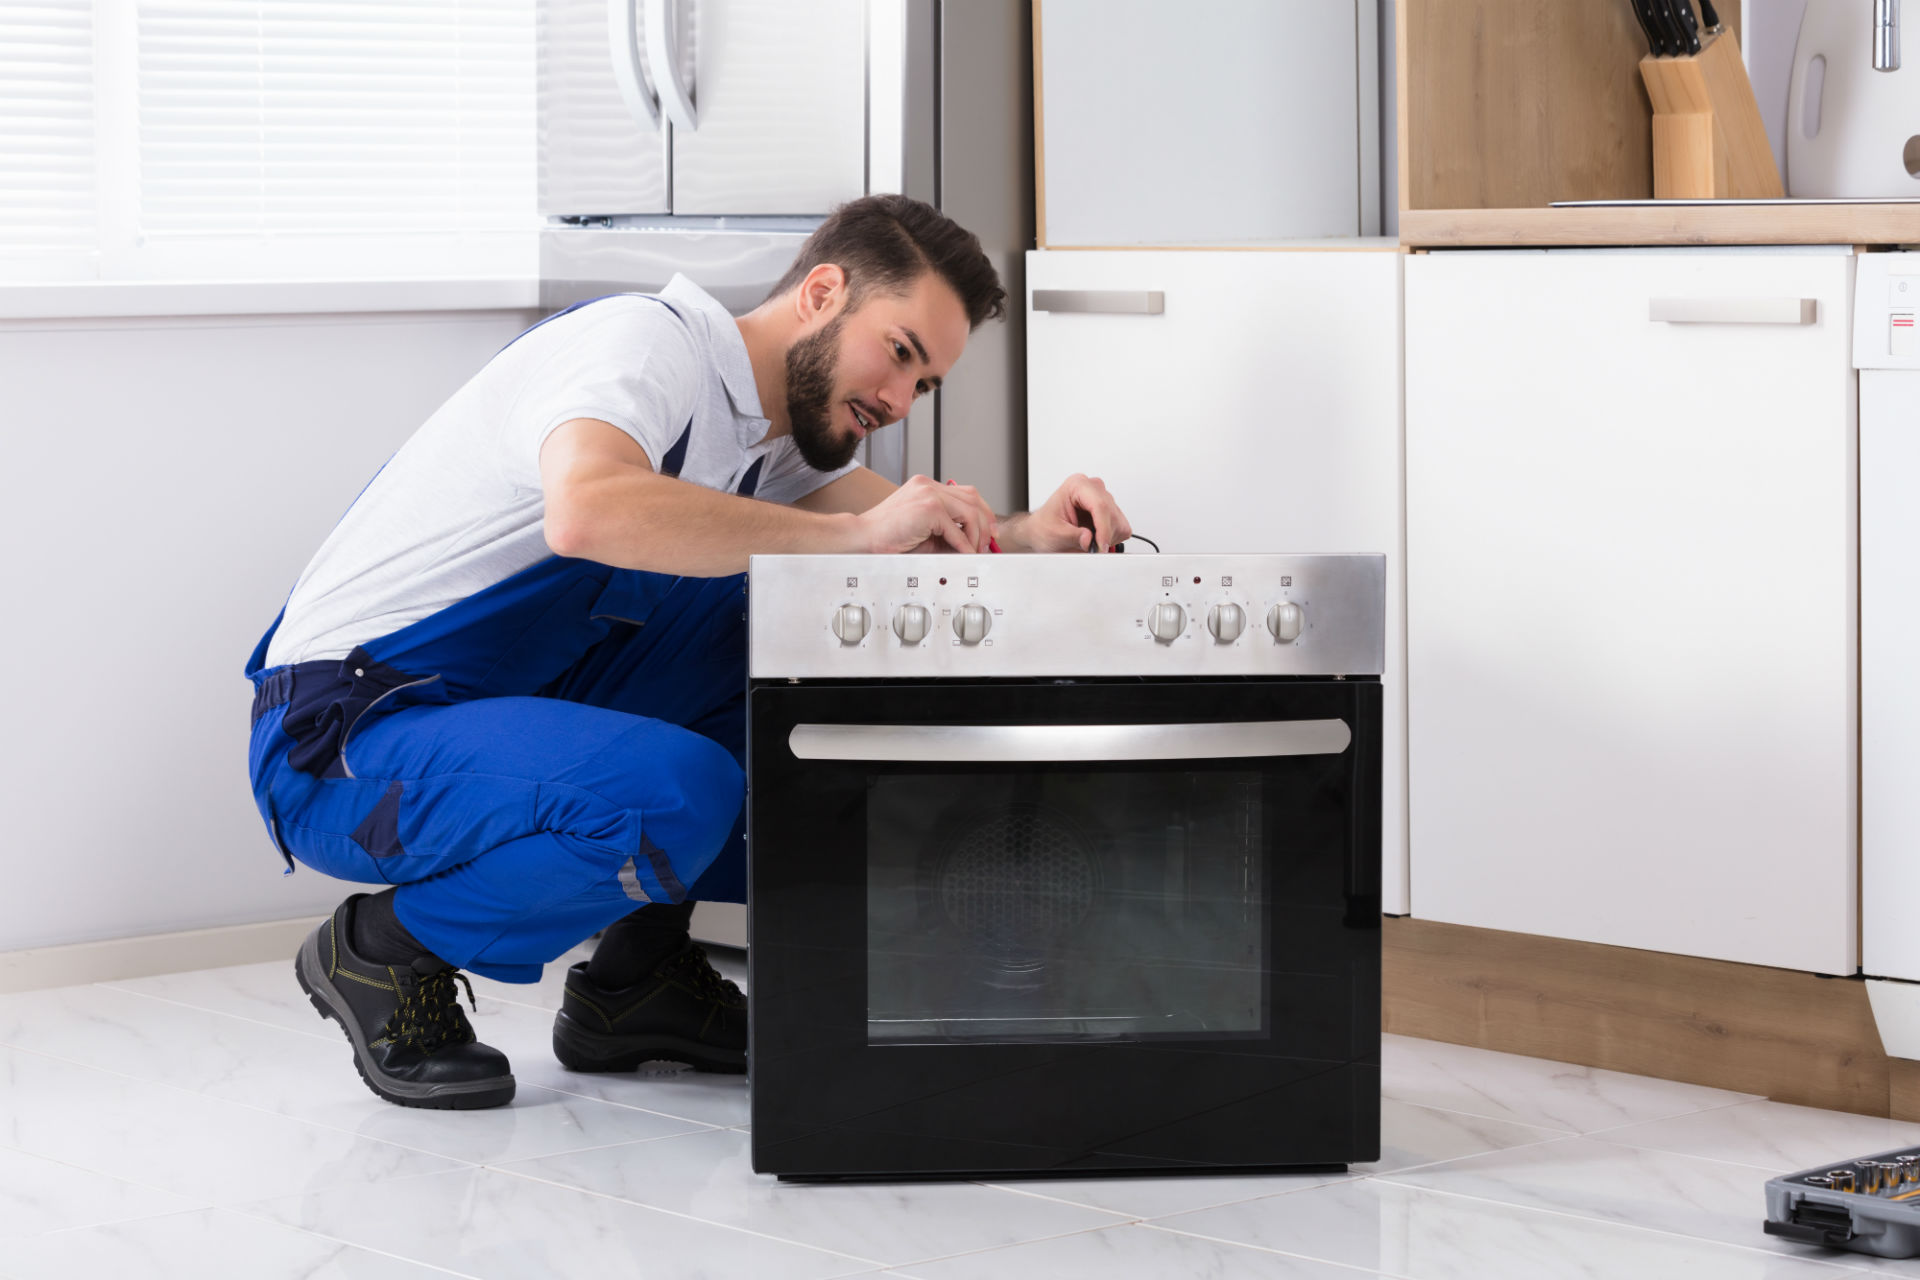 Reparación de hornos Teka en Madrid